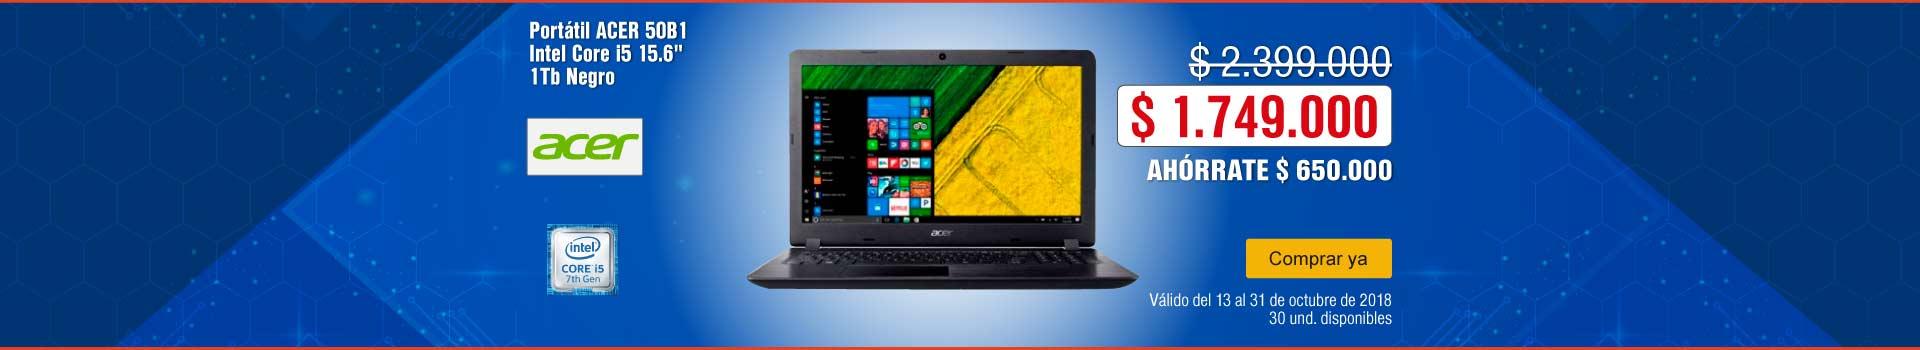 AK-BCAT-4-computadores y tablets-PP---Acer-Portátil 50B1-Oct17